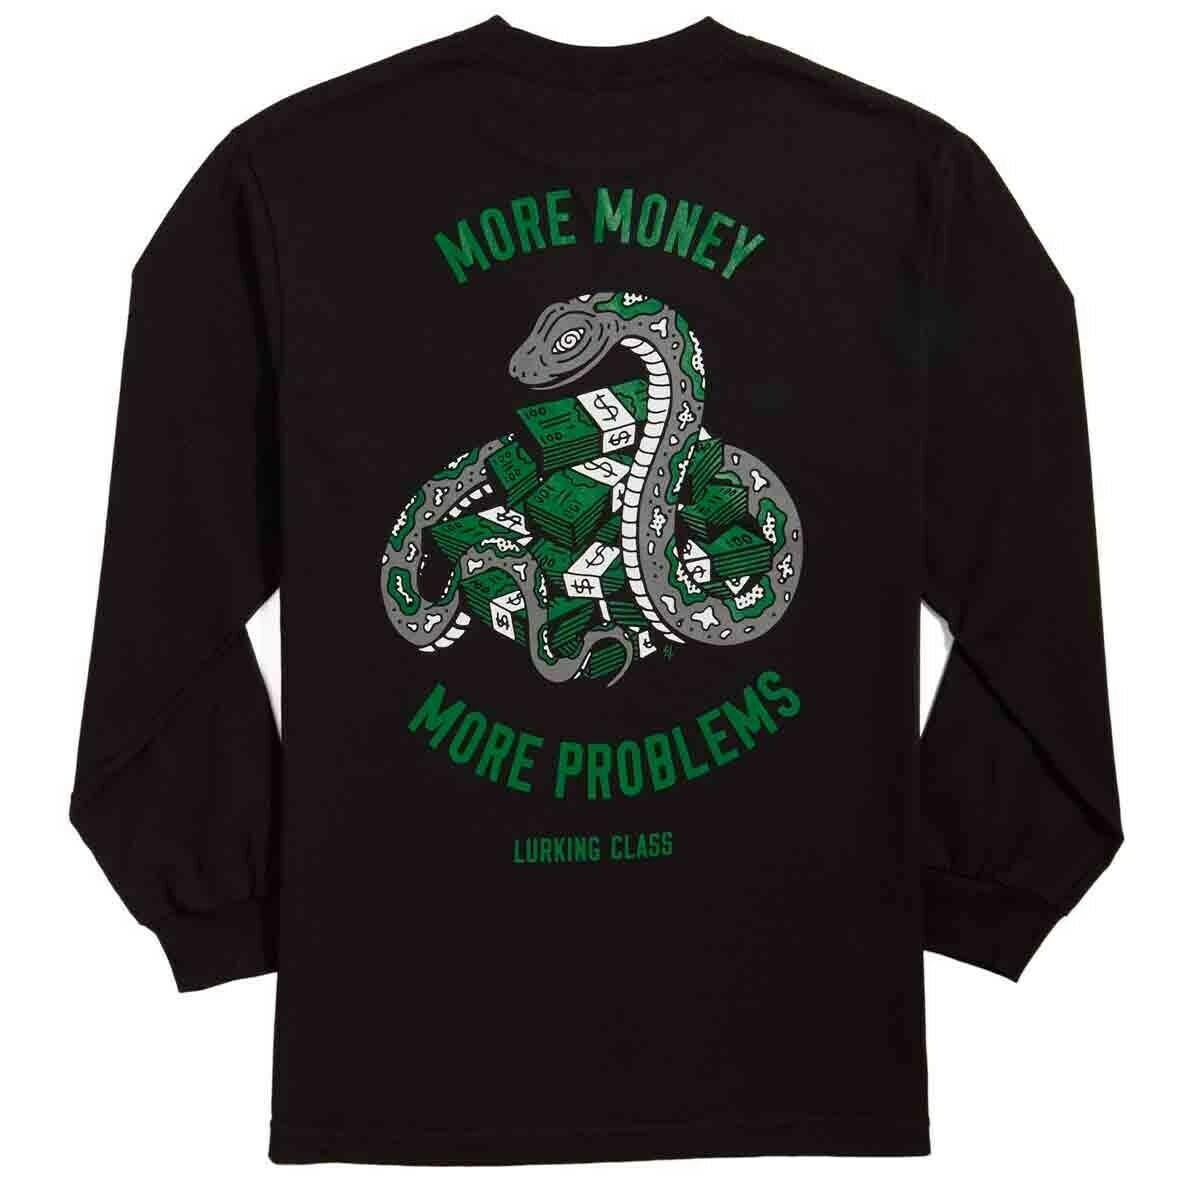 Money Problems Long Sleeve Tee